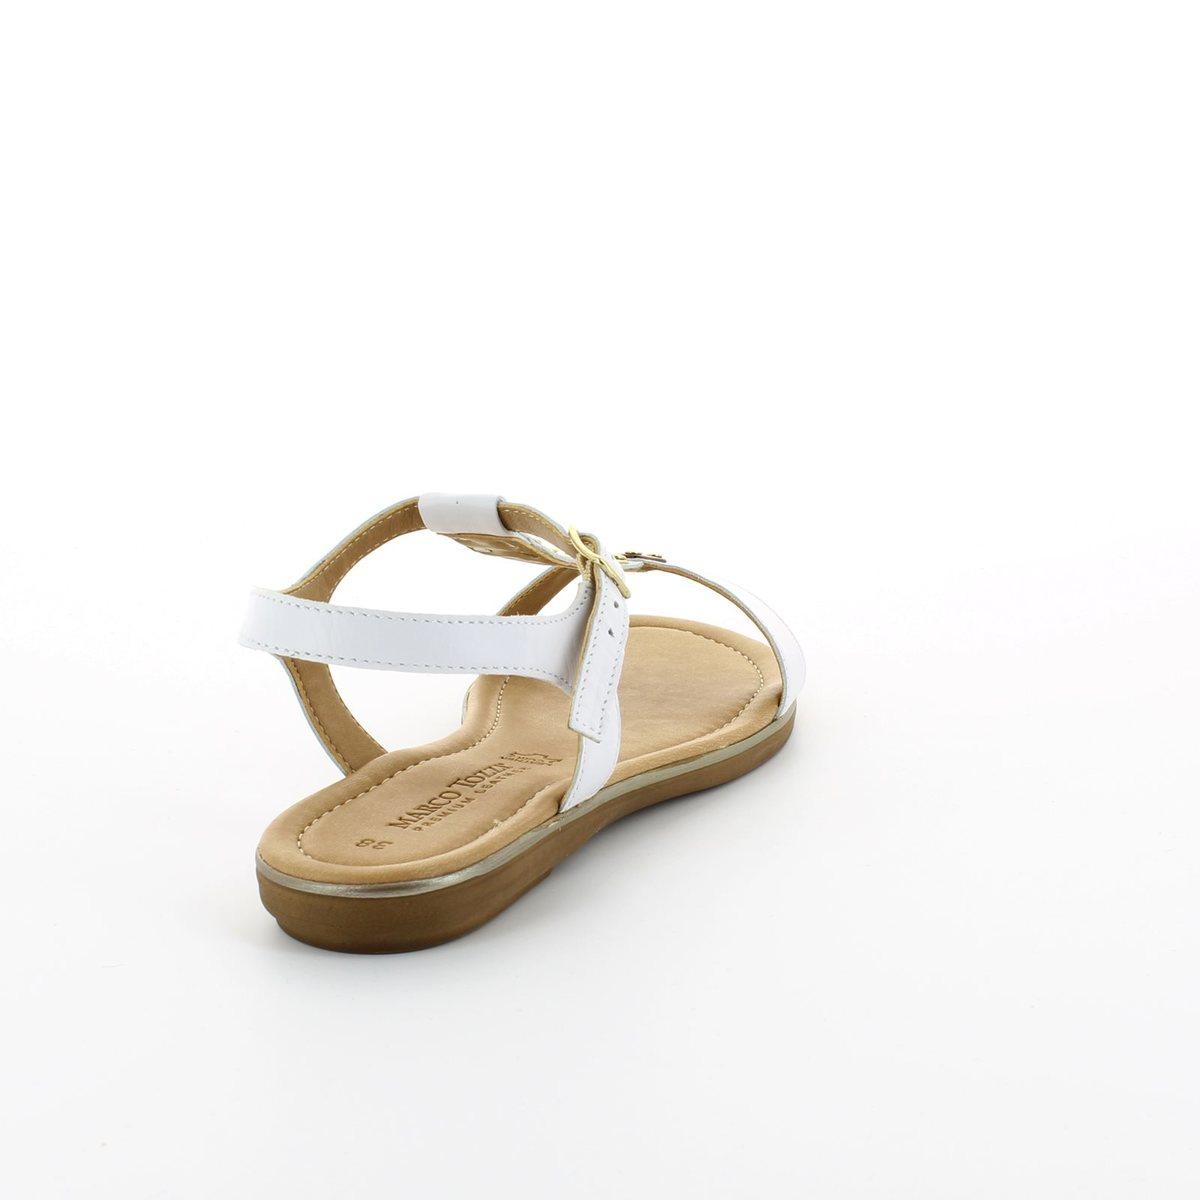 marco tozzi ruta 28161 100 white sandals. Black Bedroom Furniture Sets. Home Design Ideas